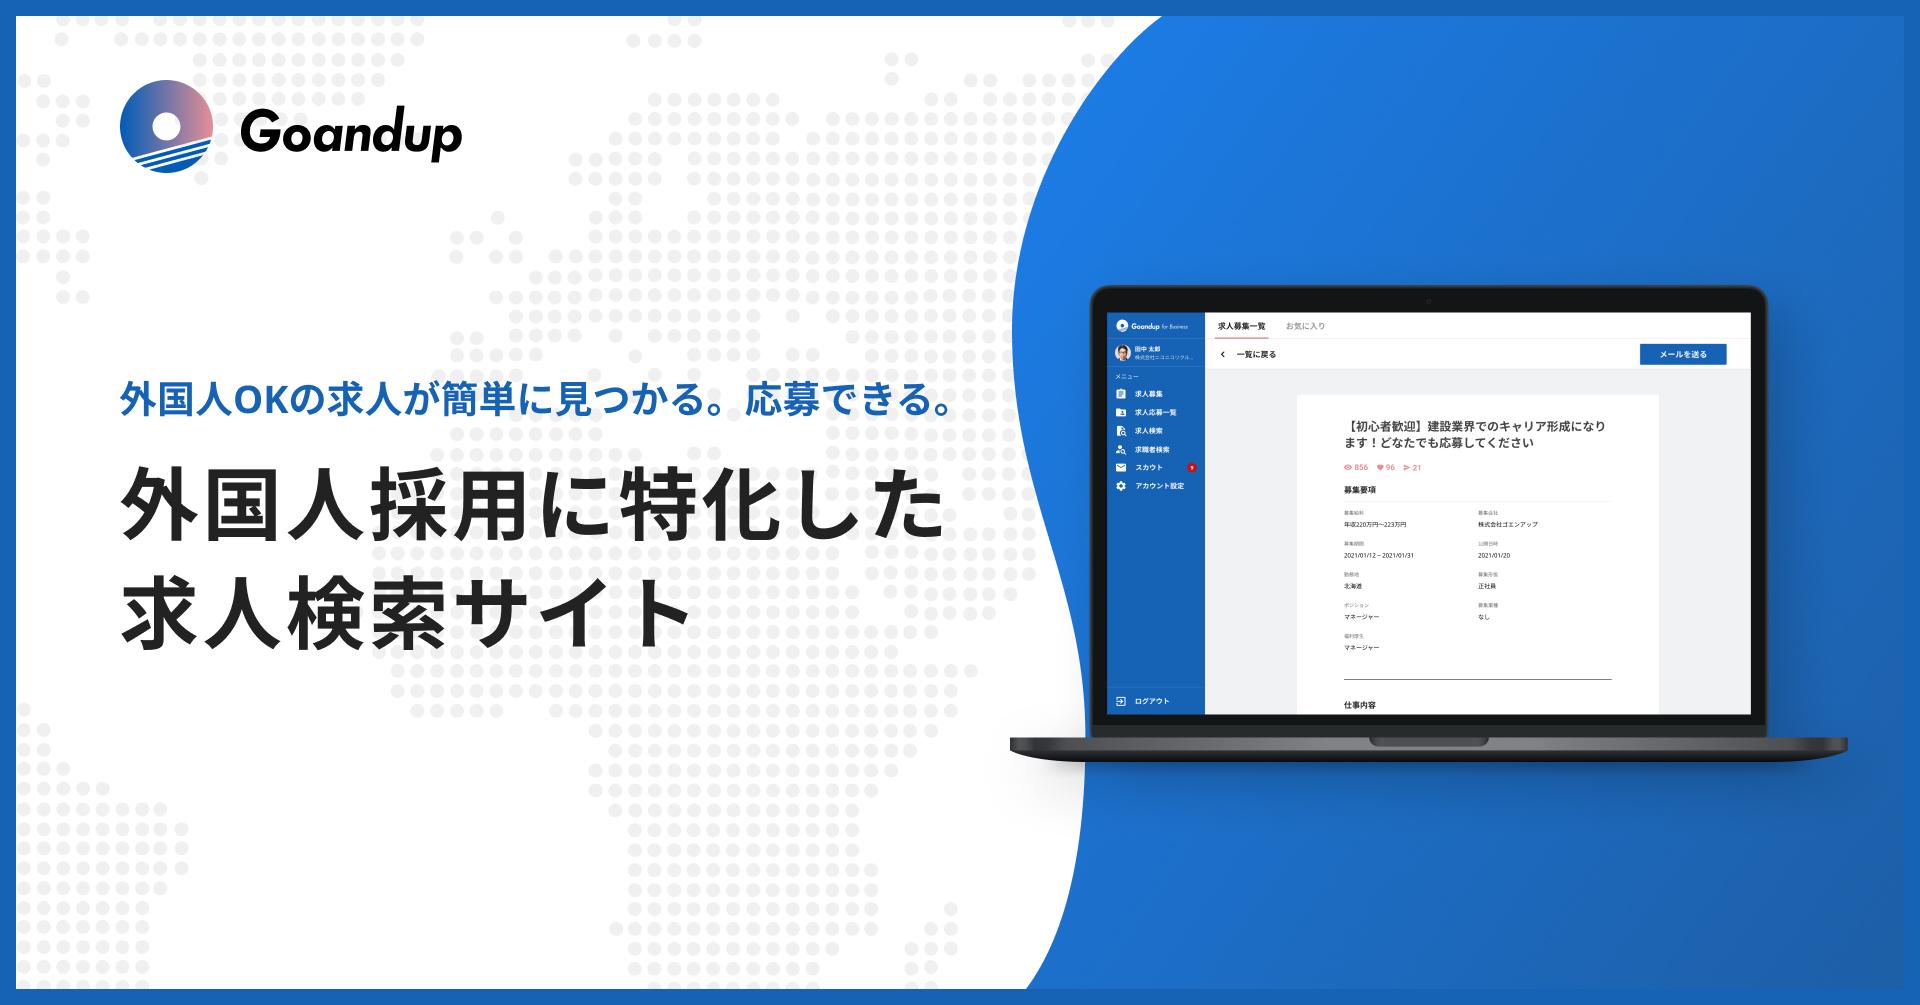 Goandup【サービス動画】 2